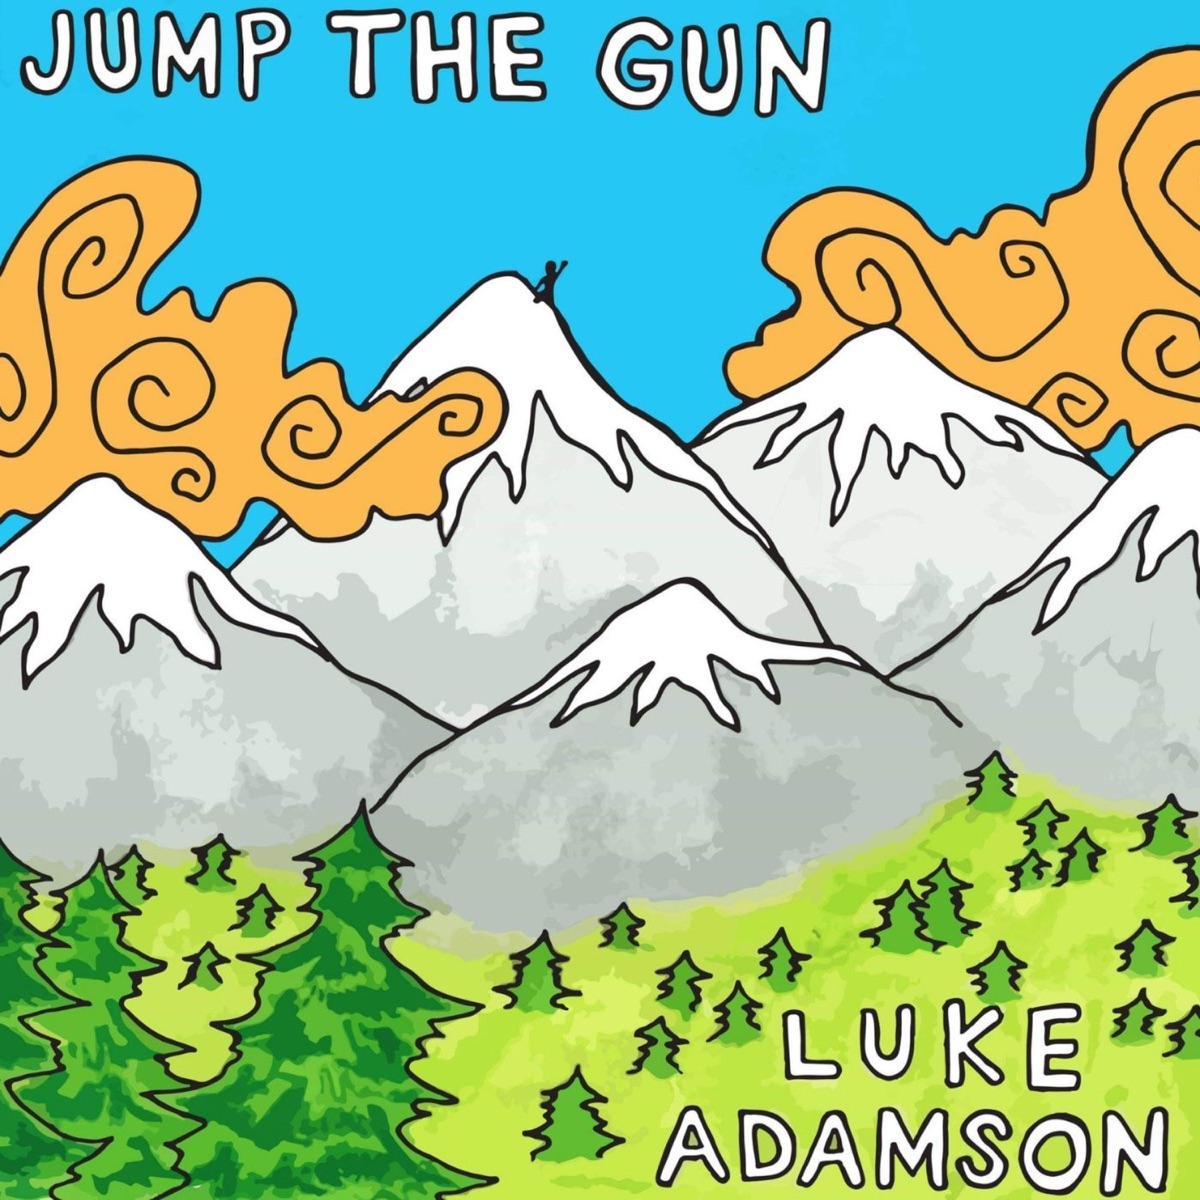 Jump the Gun - Single Luke Adamson CD cover